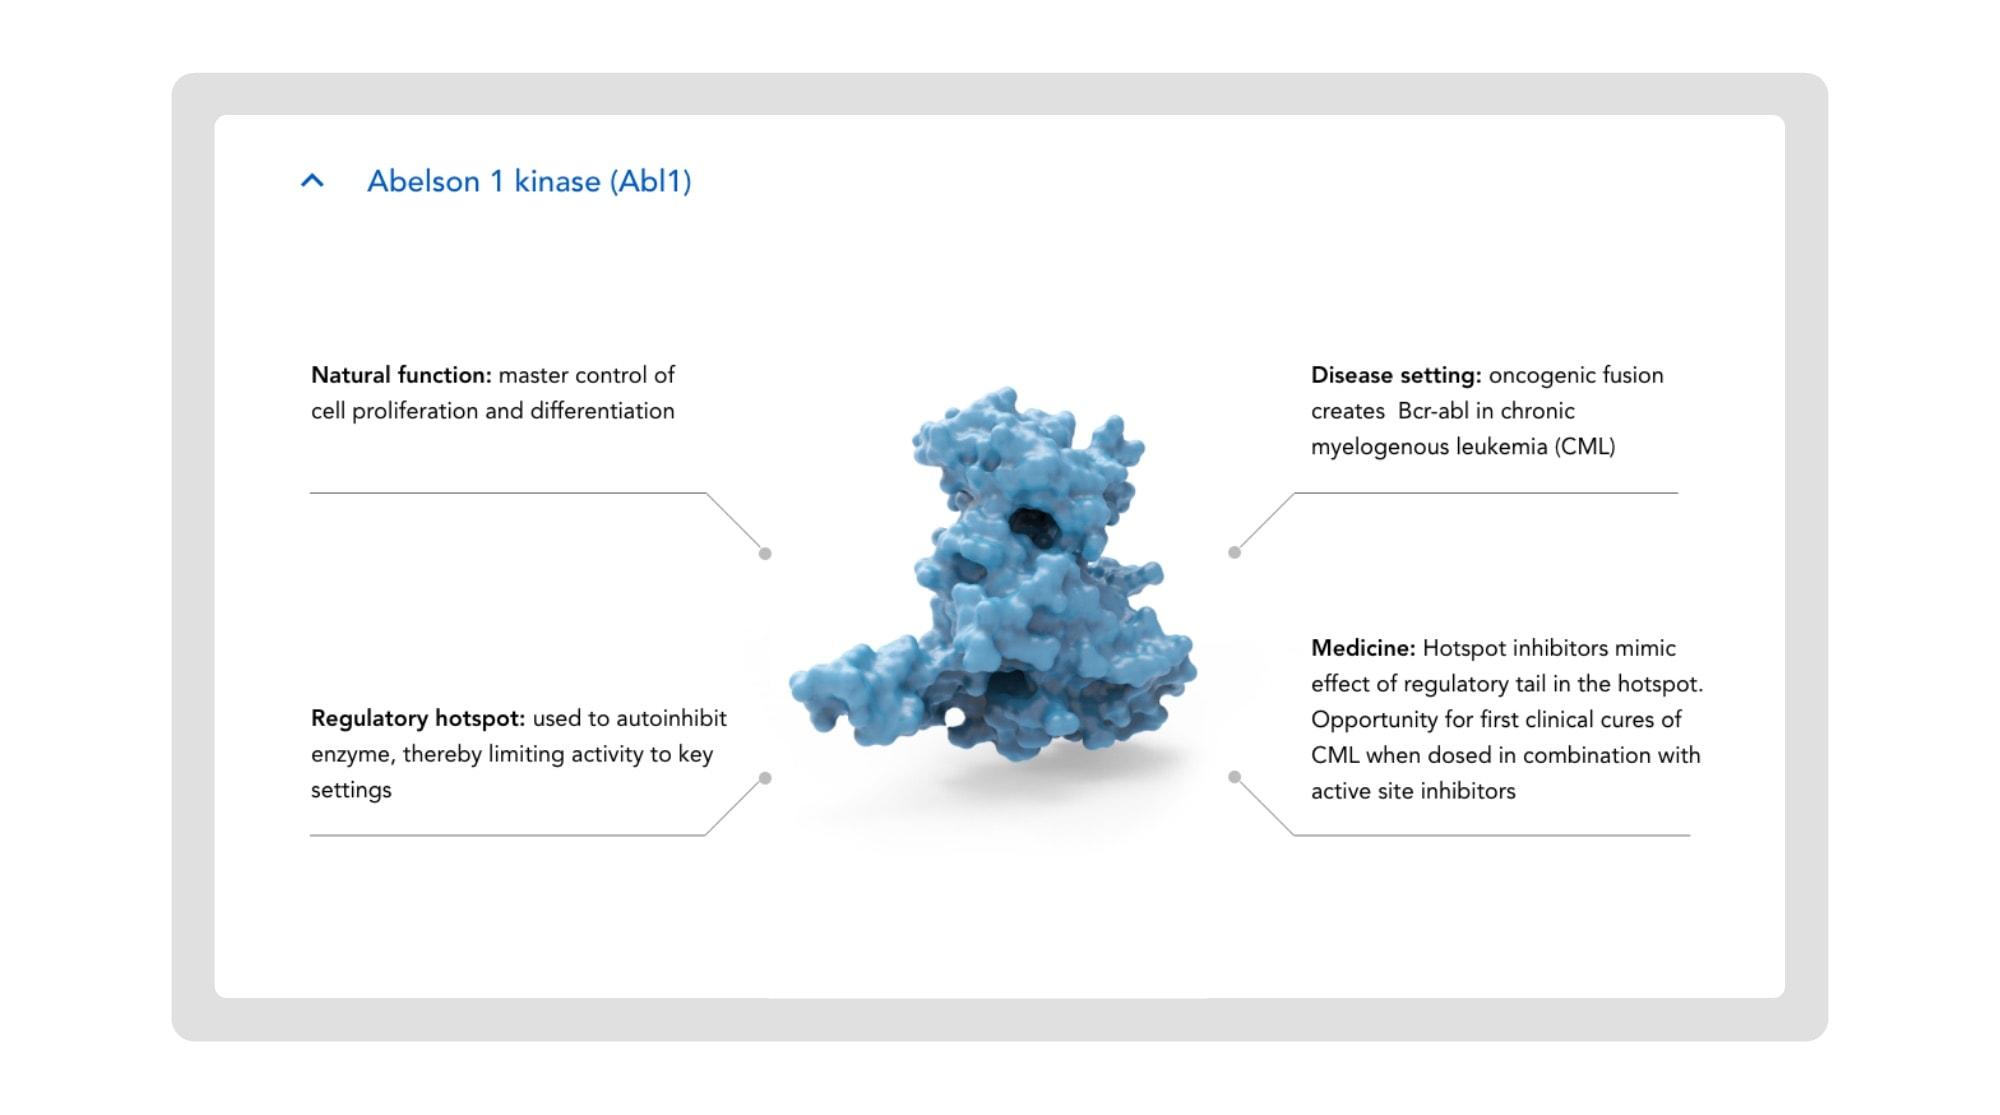 HotSpot Therapeutics Abelson 1 kinase protein with regulatory hotspot